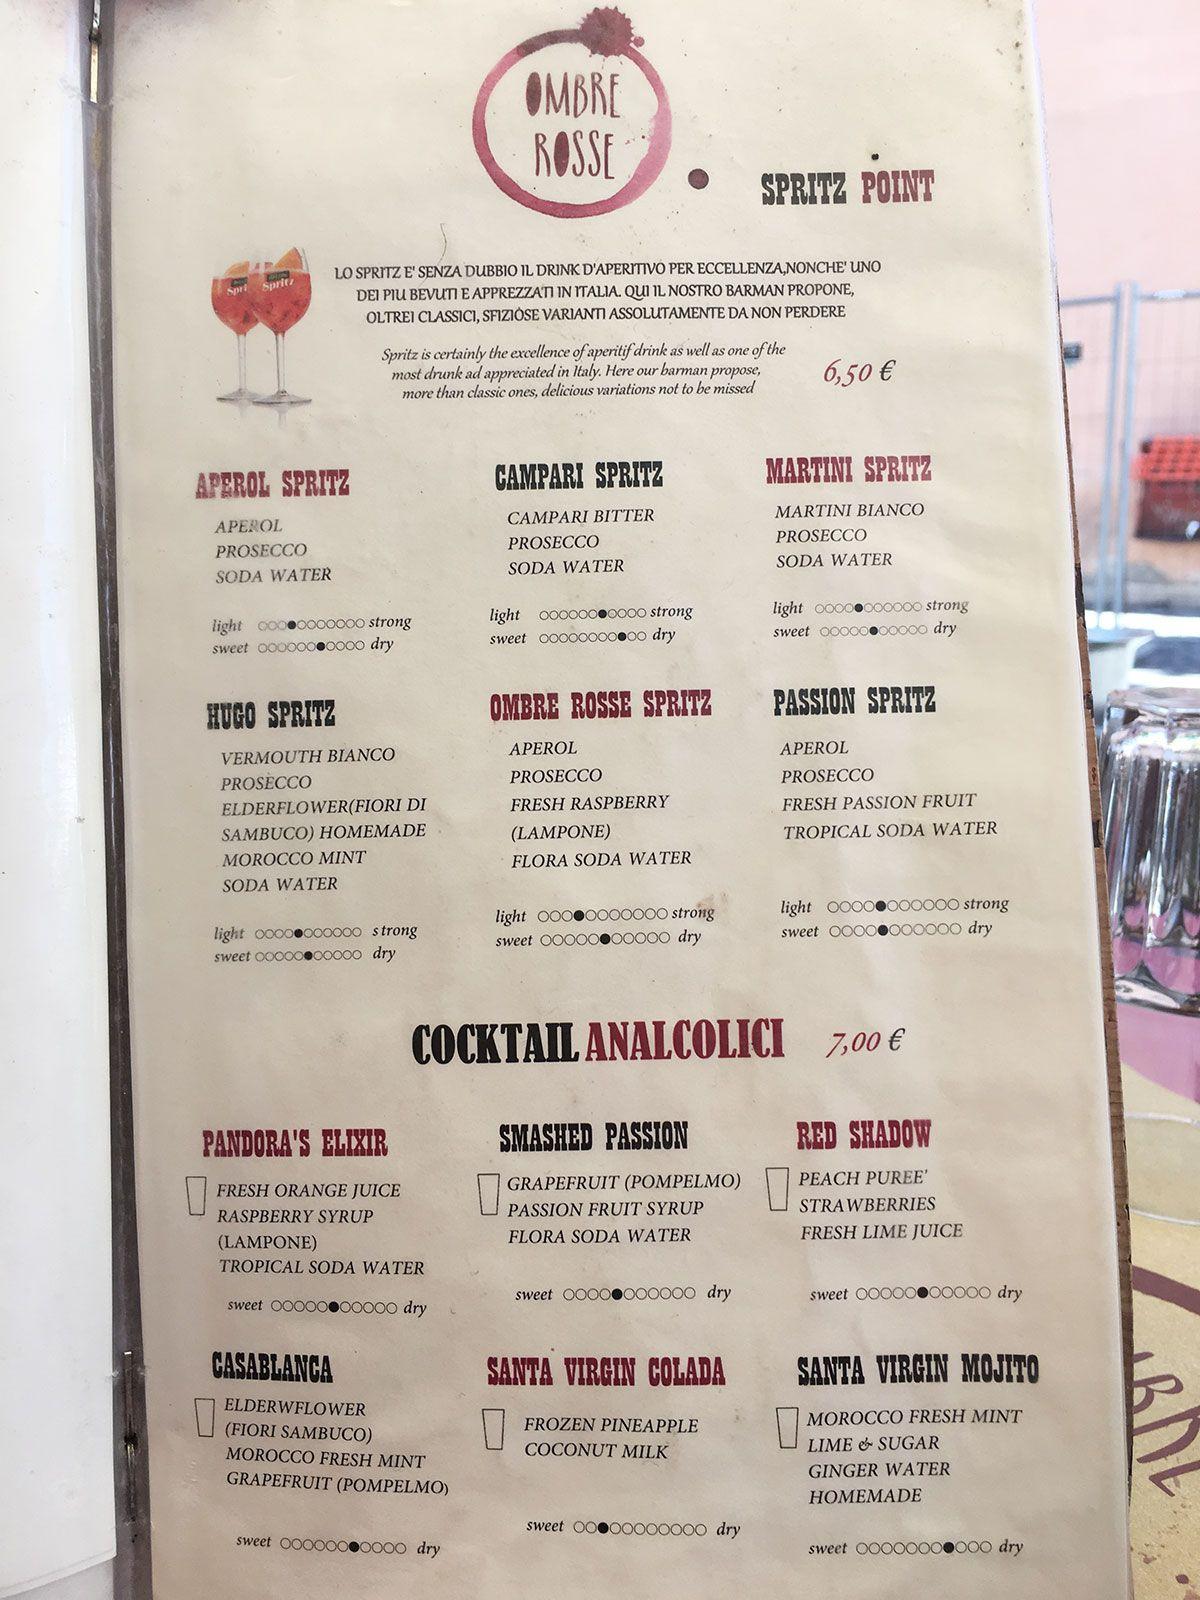 Ombre Rosse - Restaurante en Trastevere - Roma - Carta de spritz